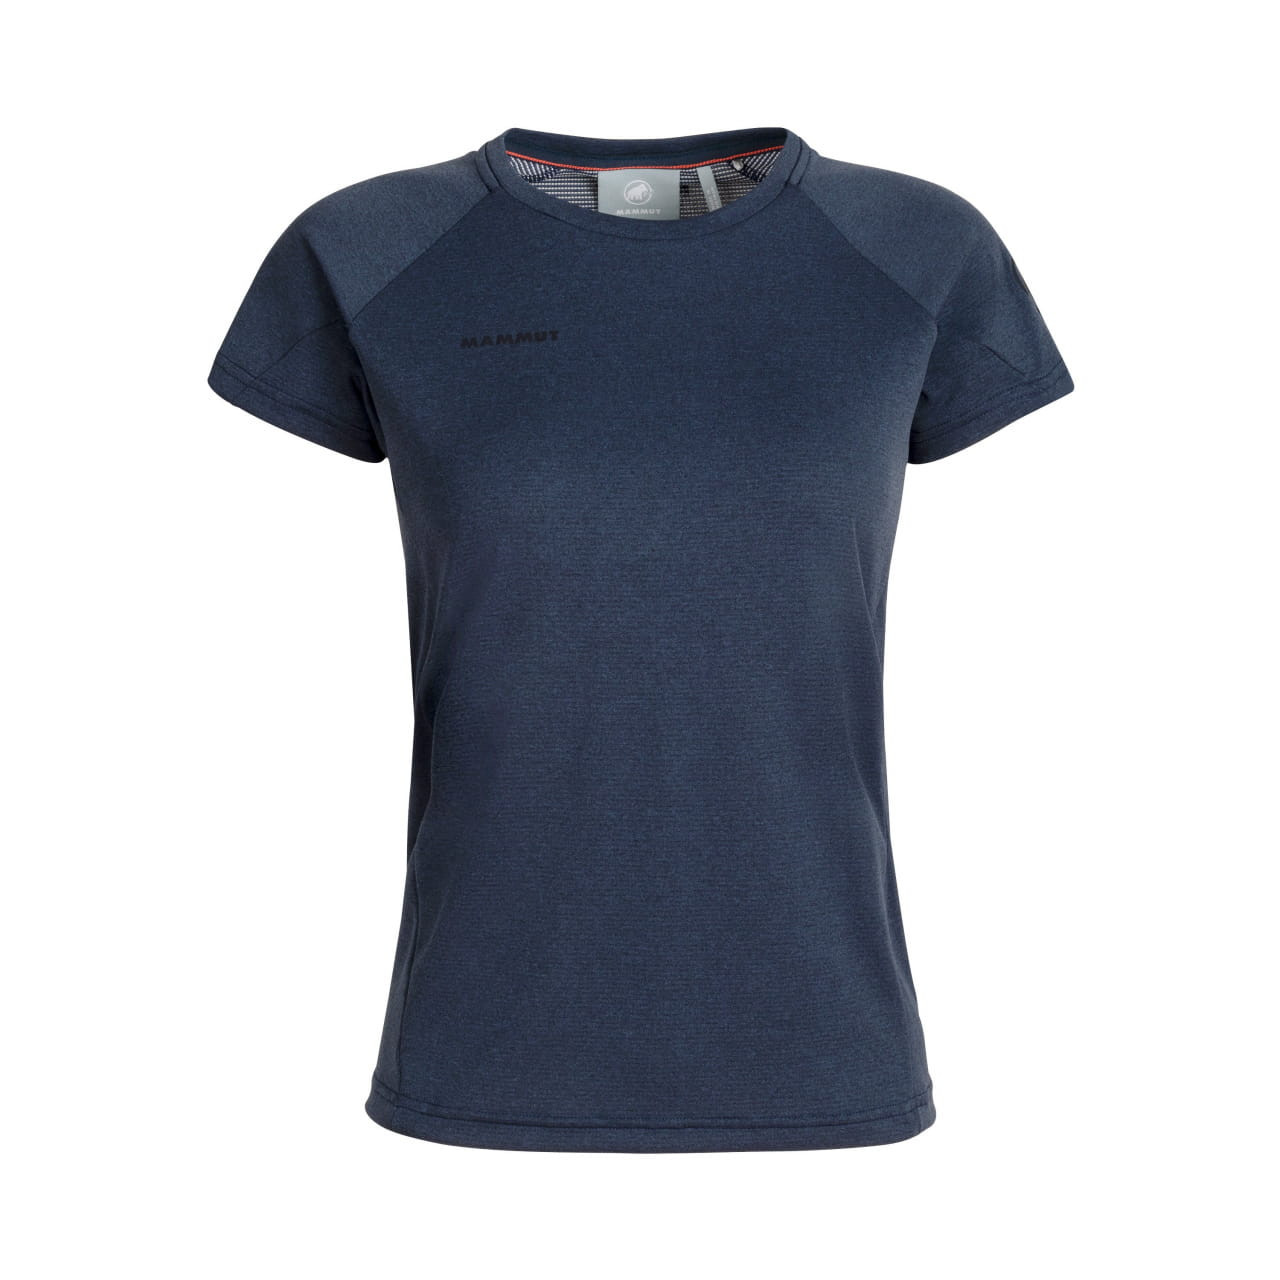 Dámské tričko Mammut Aegility T-Shirt Women